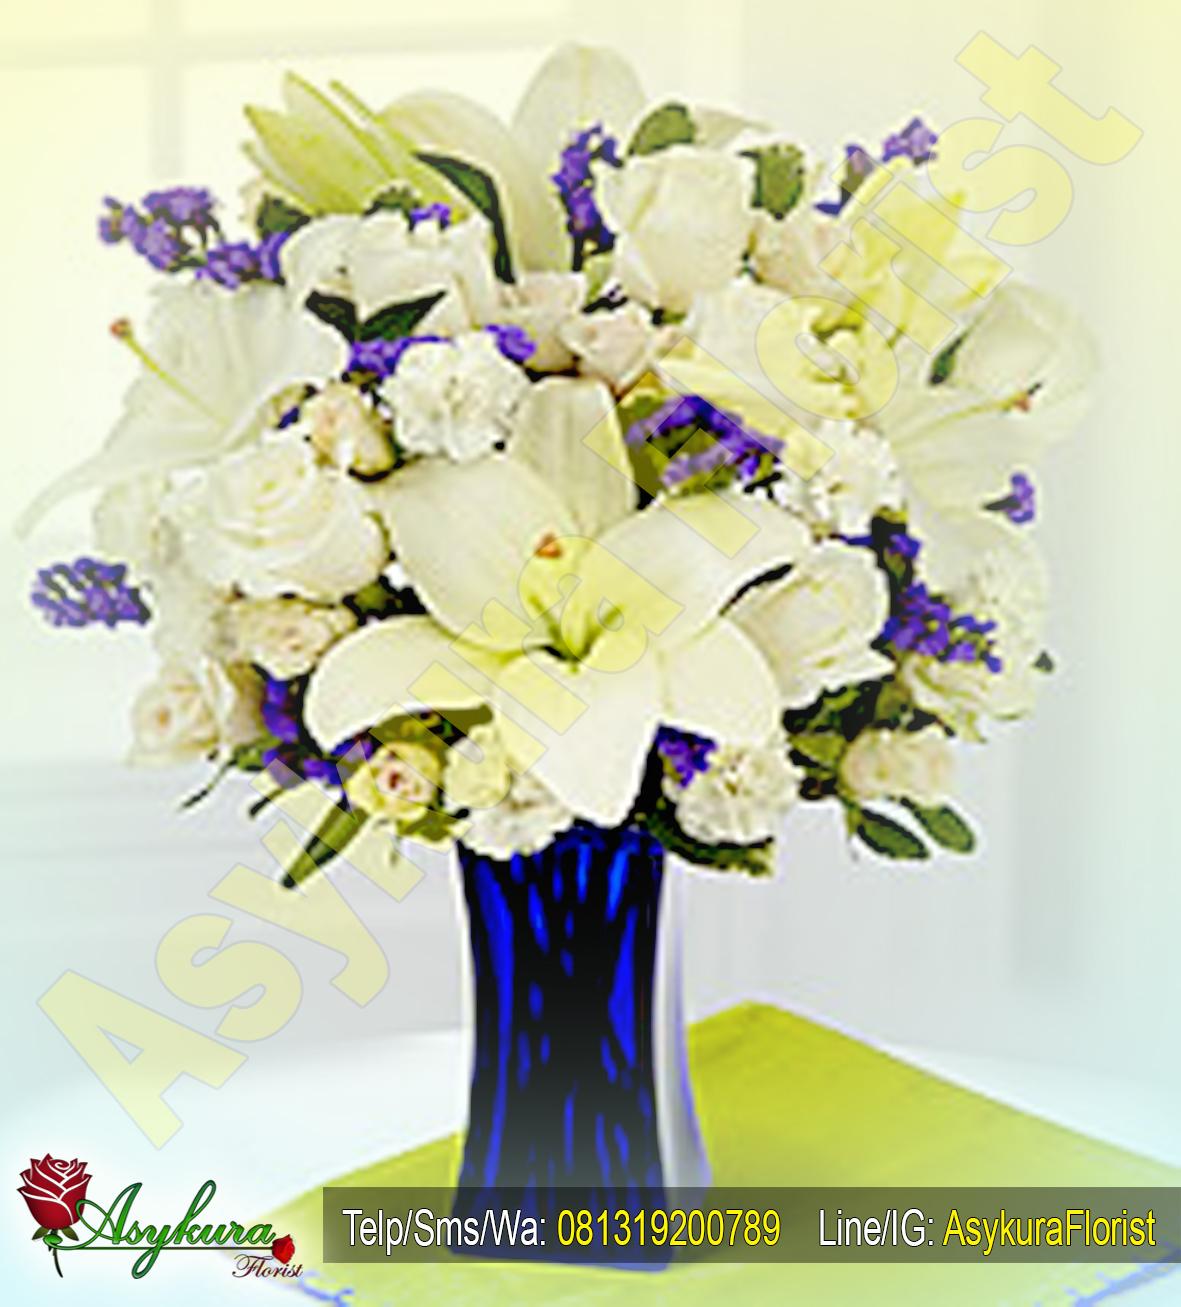 Rangkaian Bunga Meja Table Flower Toko Karawang Asykura Impor